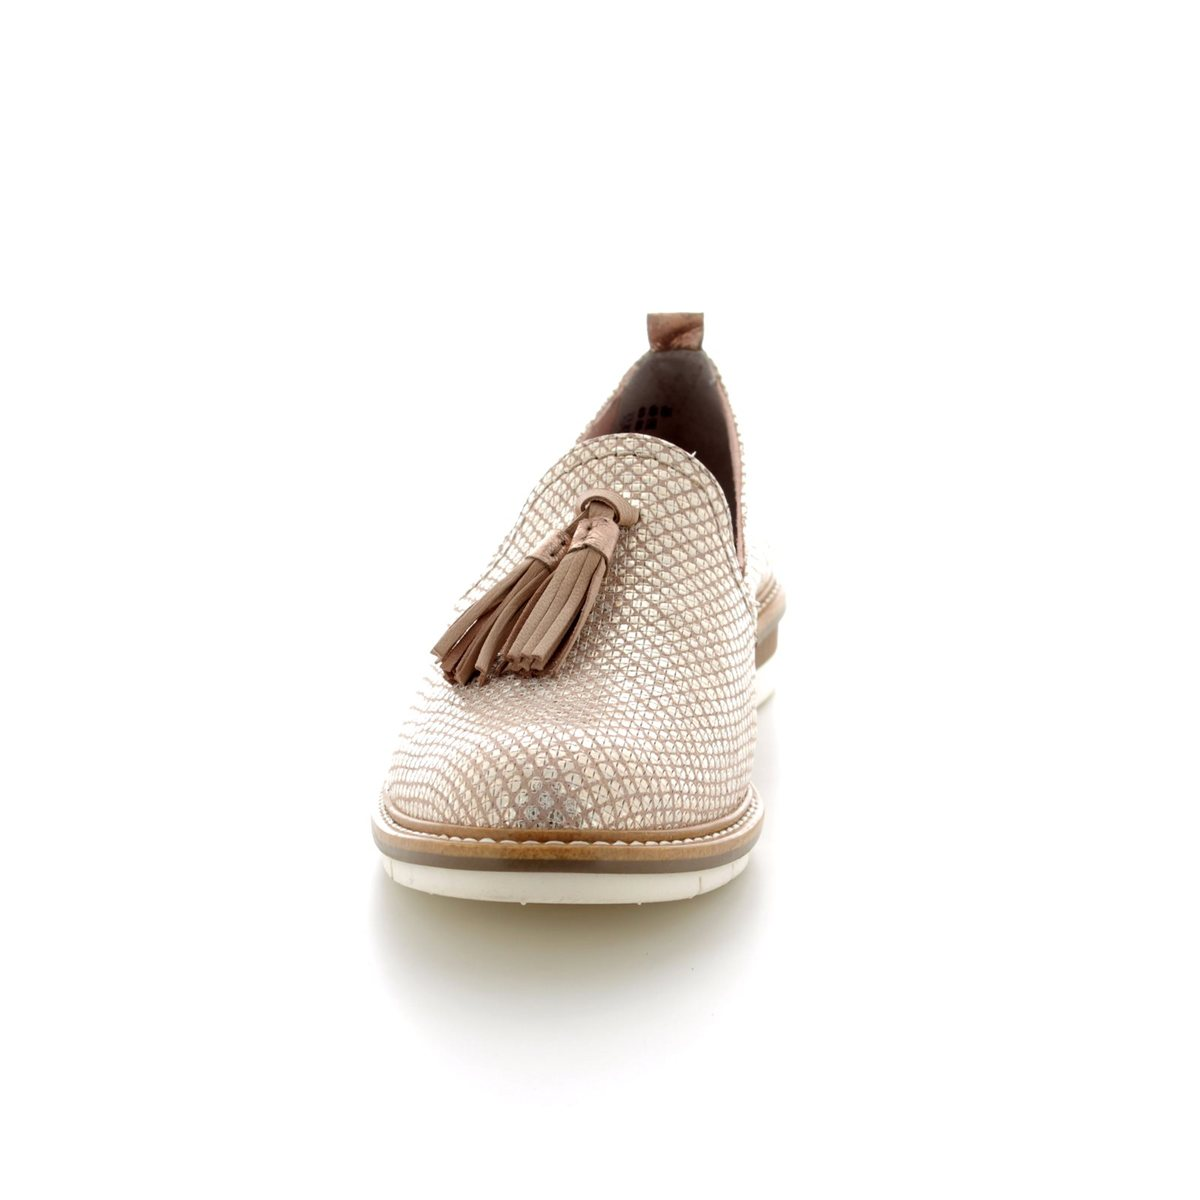 2430020426 Kela at Begg Shoes & Bags